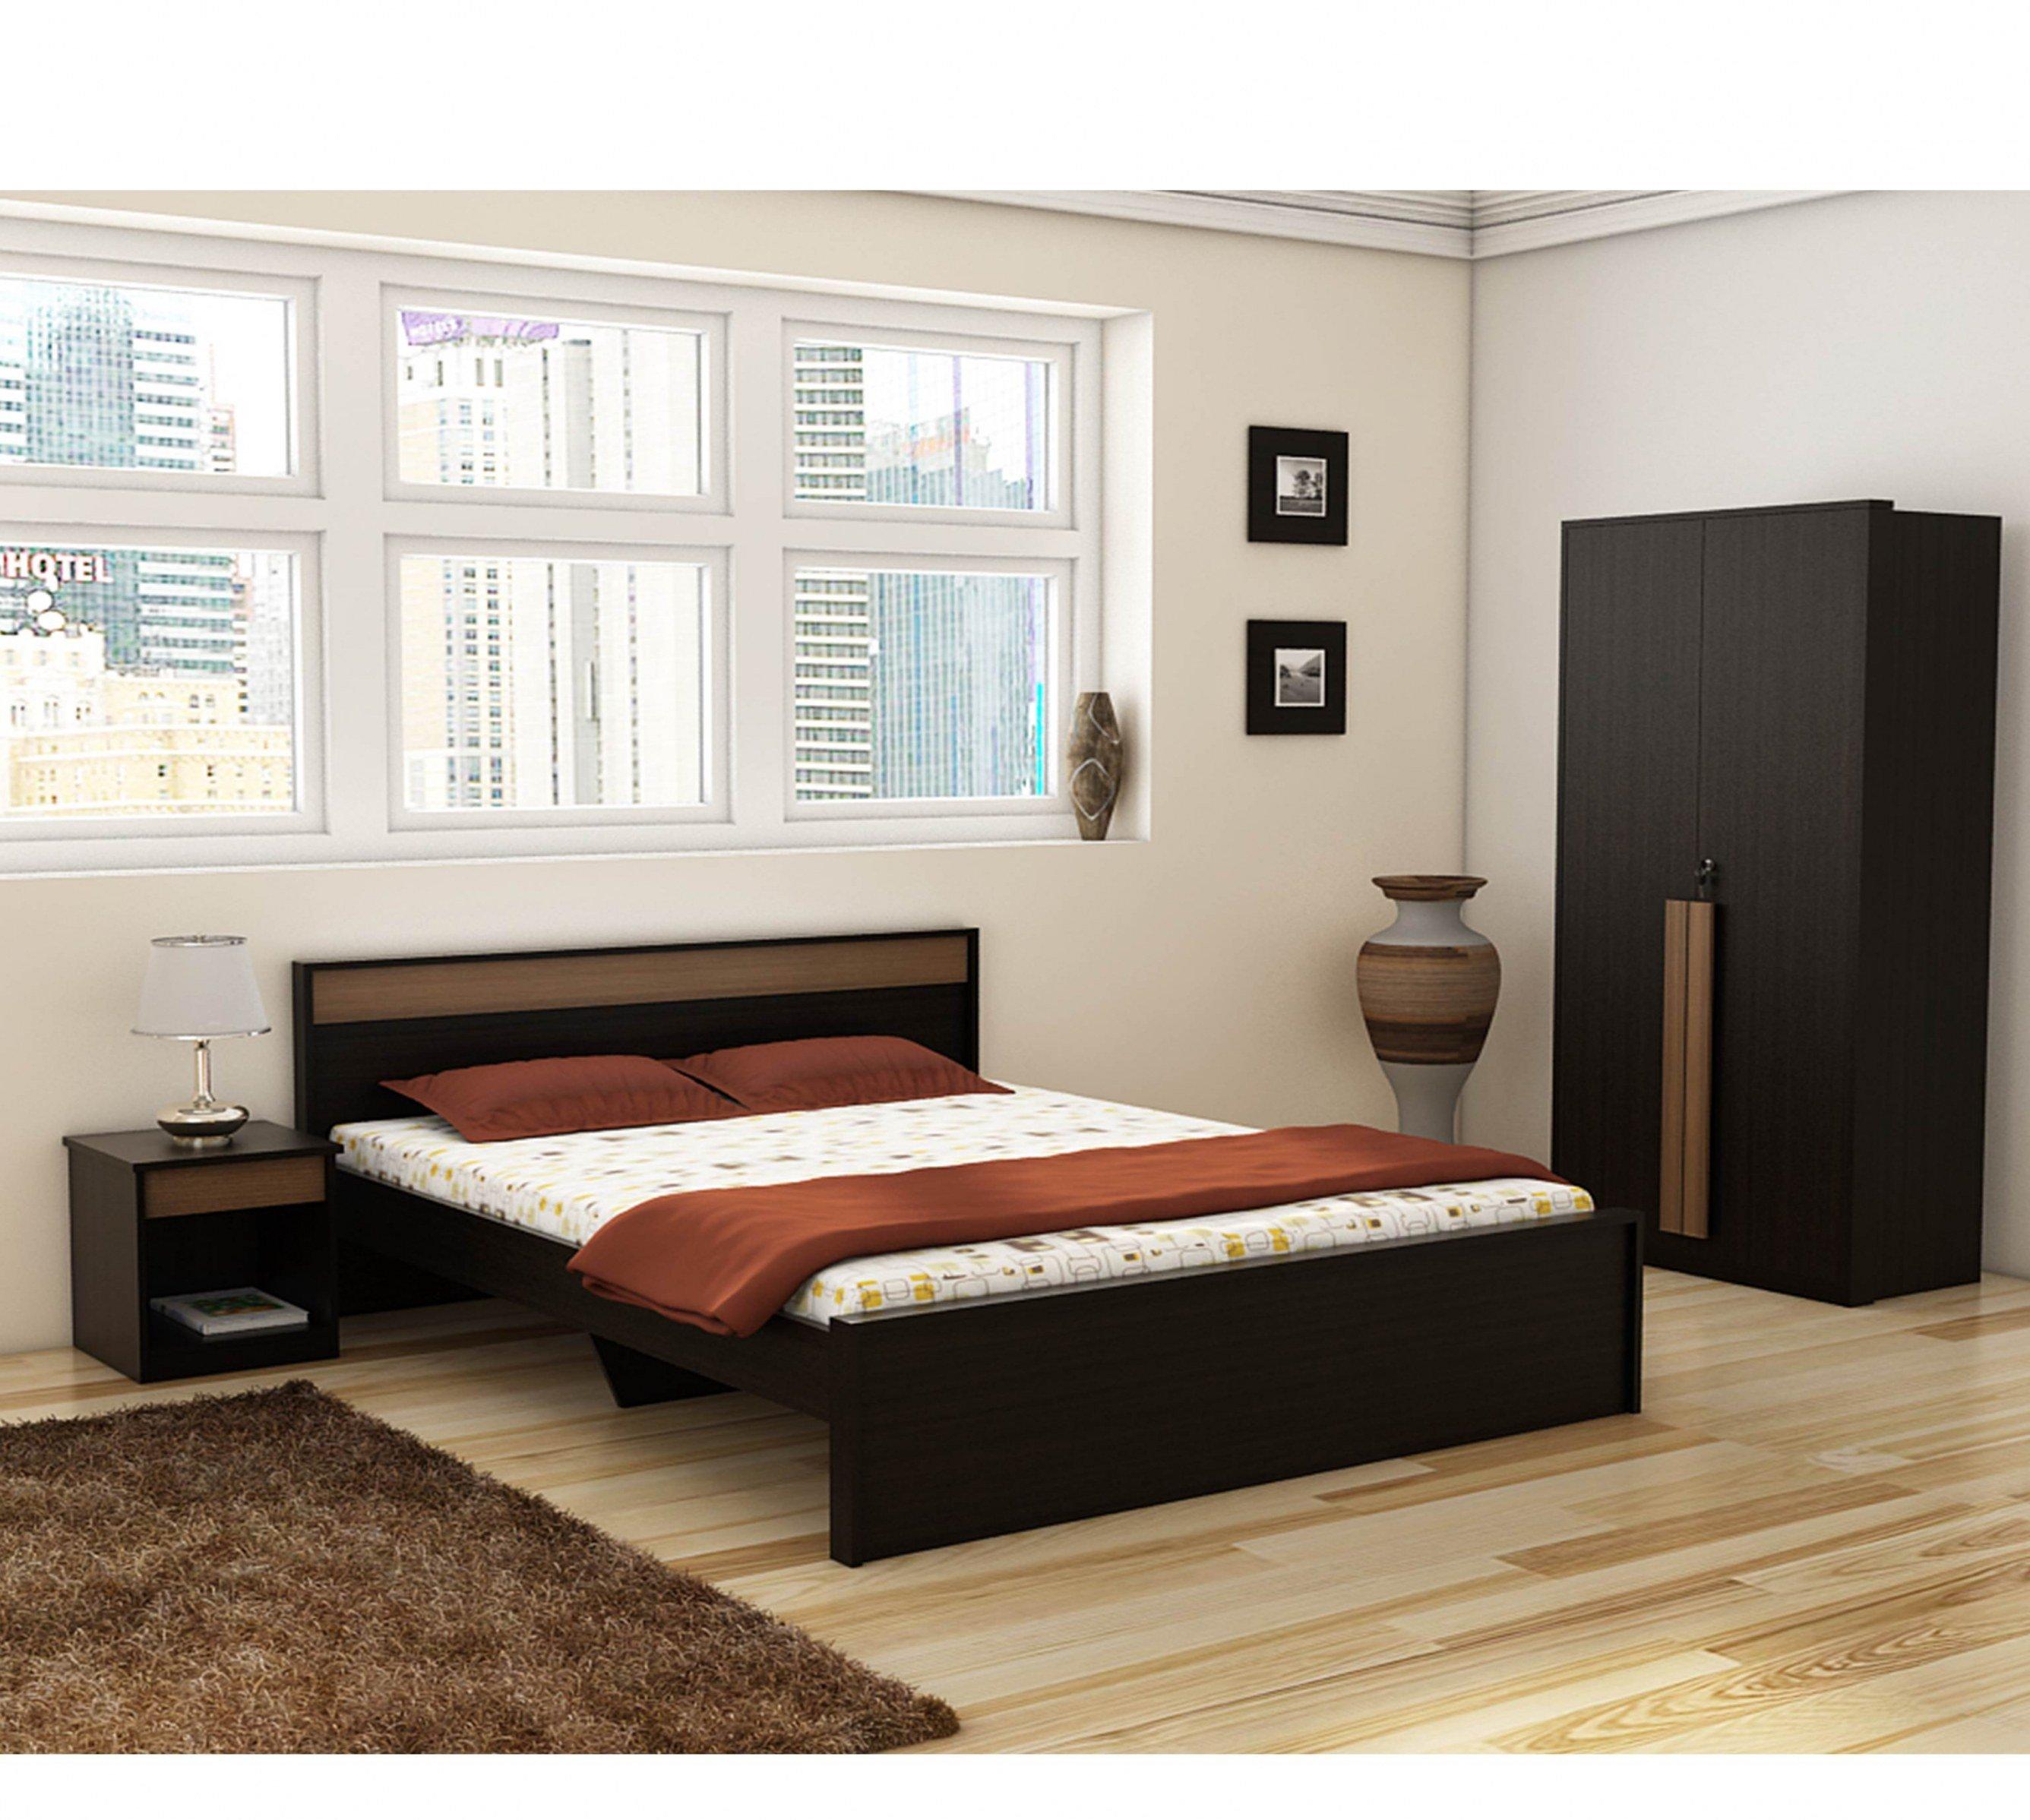 Ikea Bedroom Furniture Set Lovely Low Beds Ikea White Bedroom Furniture Sets Ikea White Hemnes